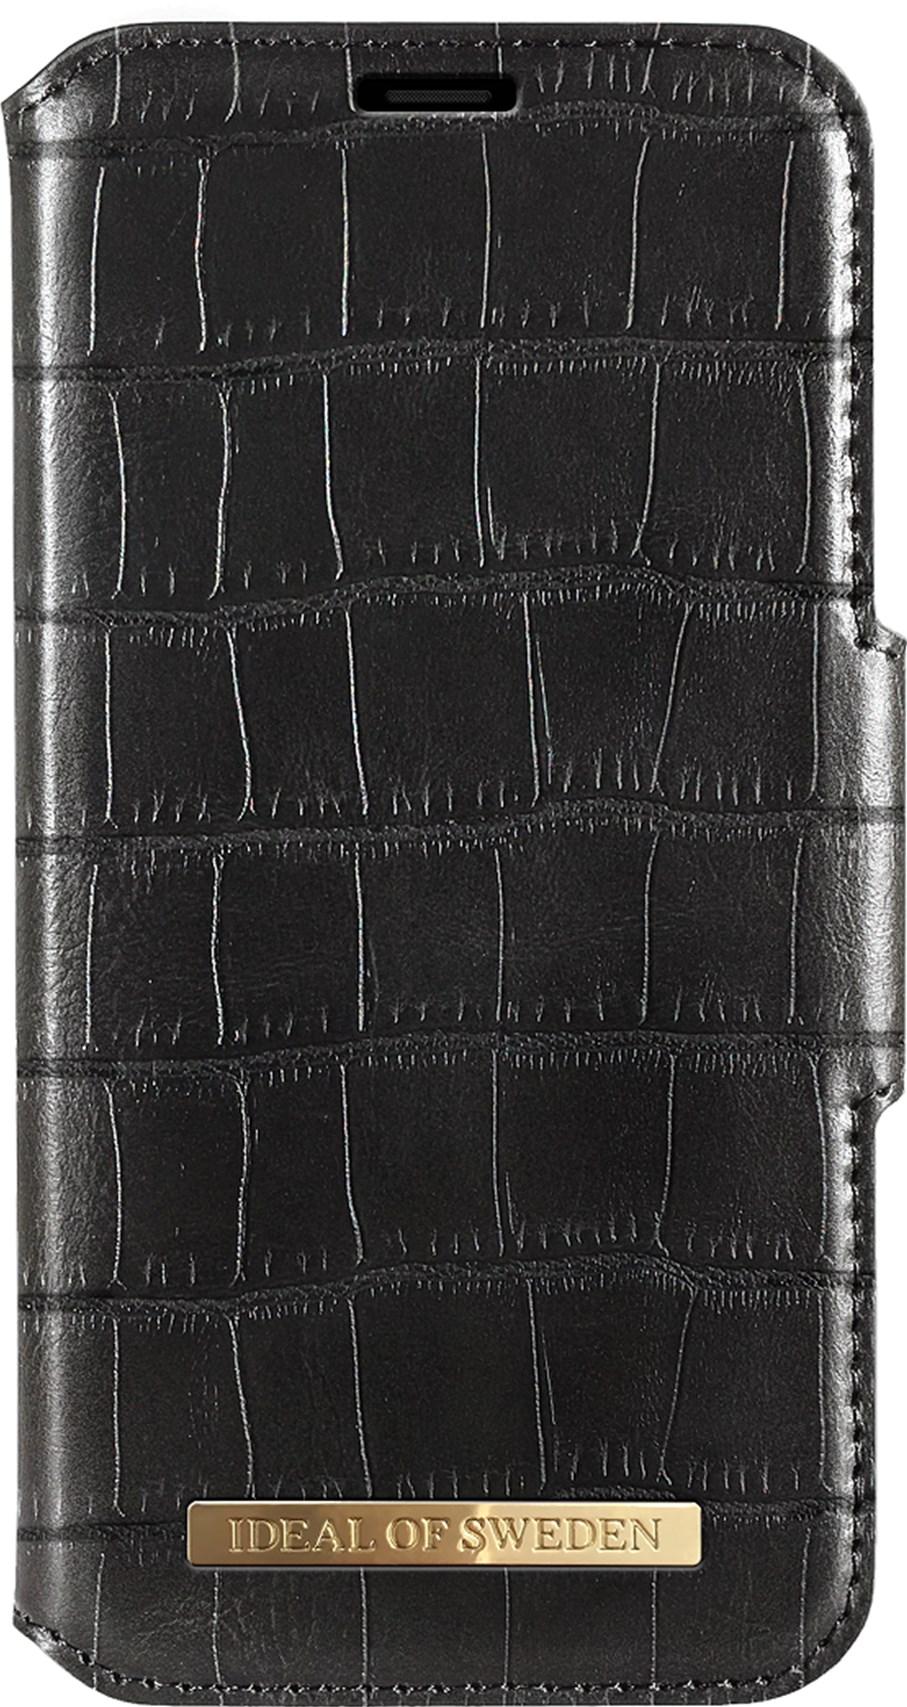 iDeal of Sweden Ideal Capri Wallet Samsung Galaxy S10 Plus Black Croco